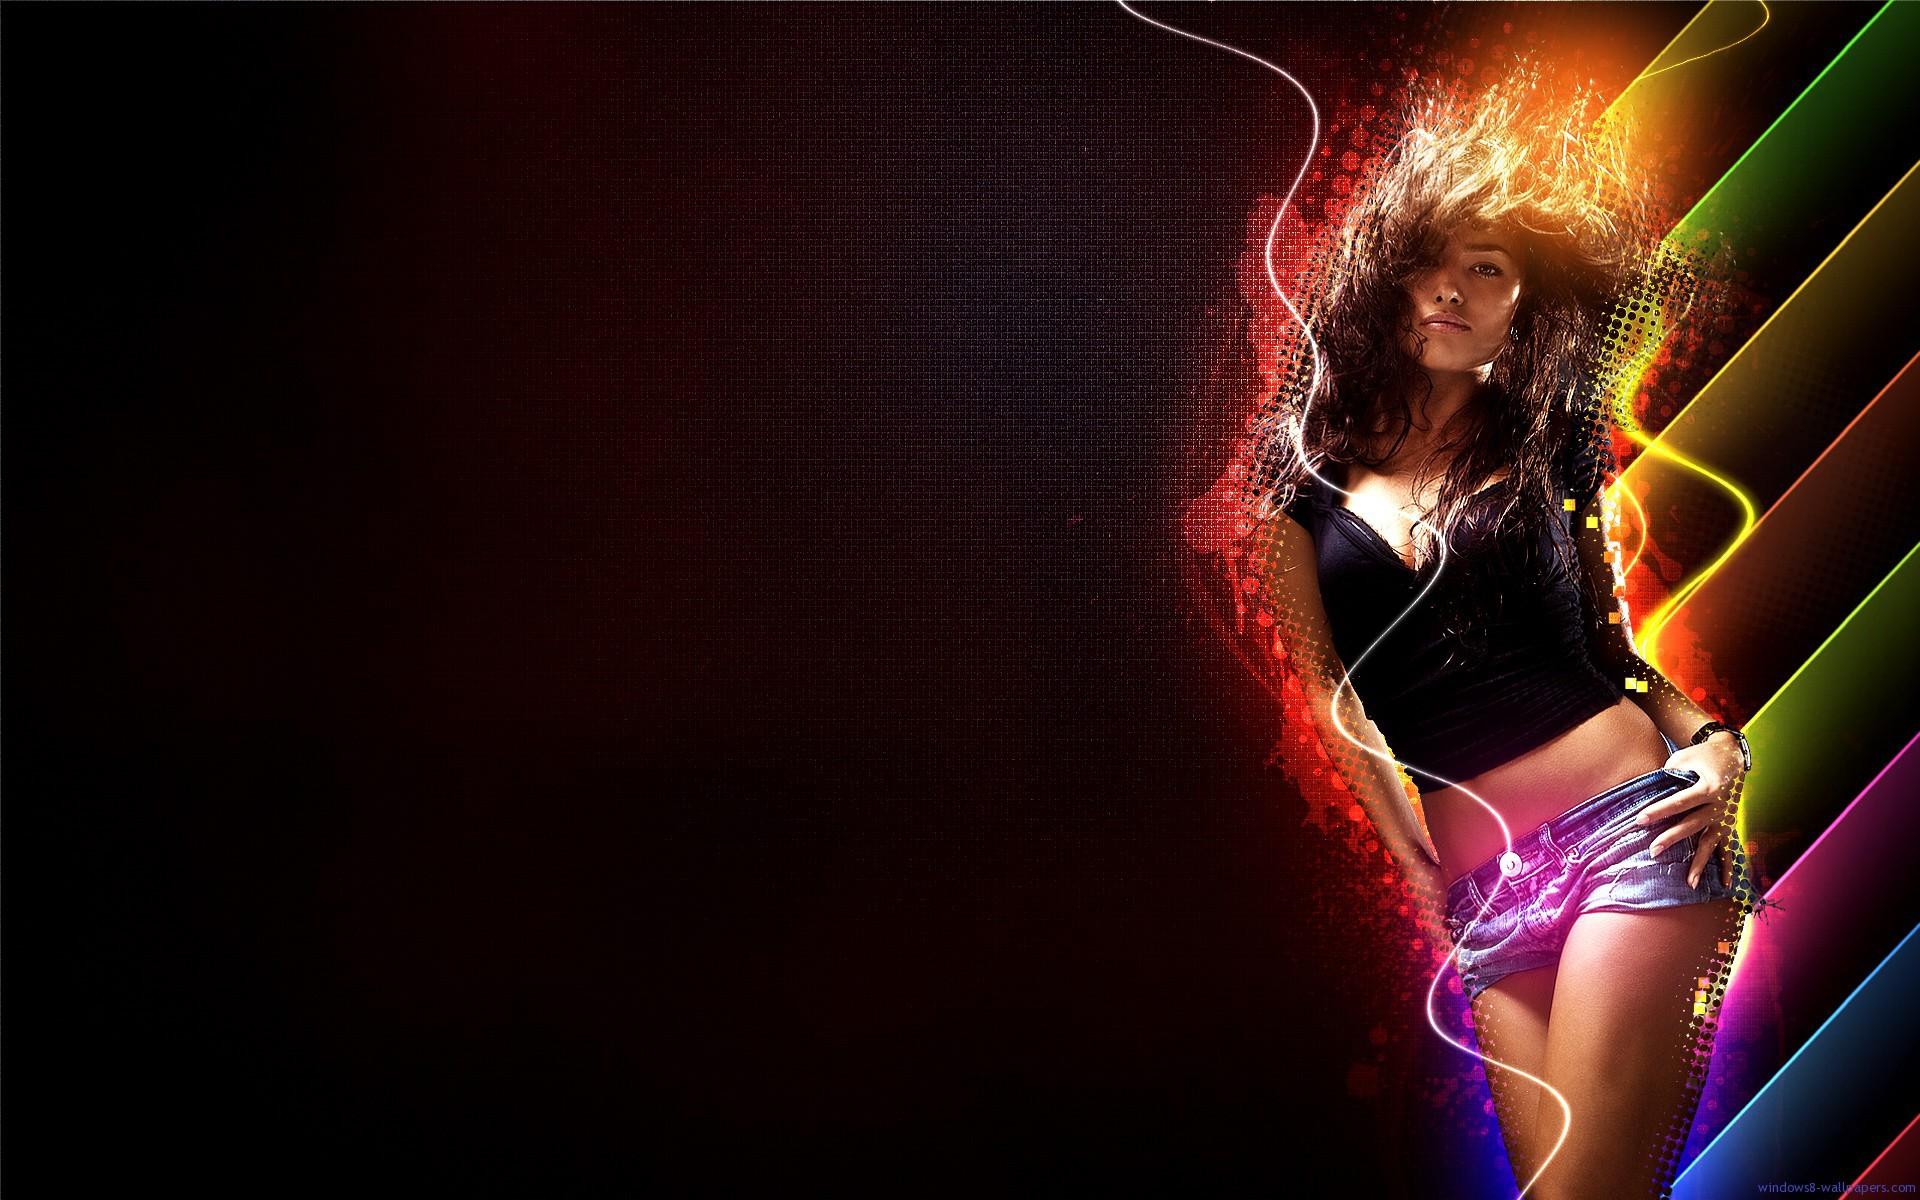 3d Girl Dance Hd Wallpapers: Dancing Wallpaper